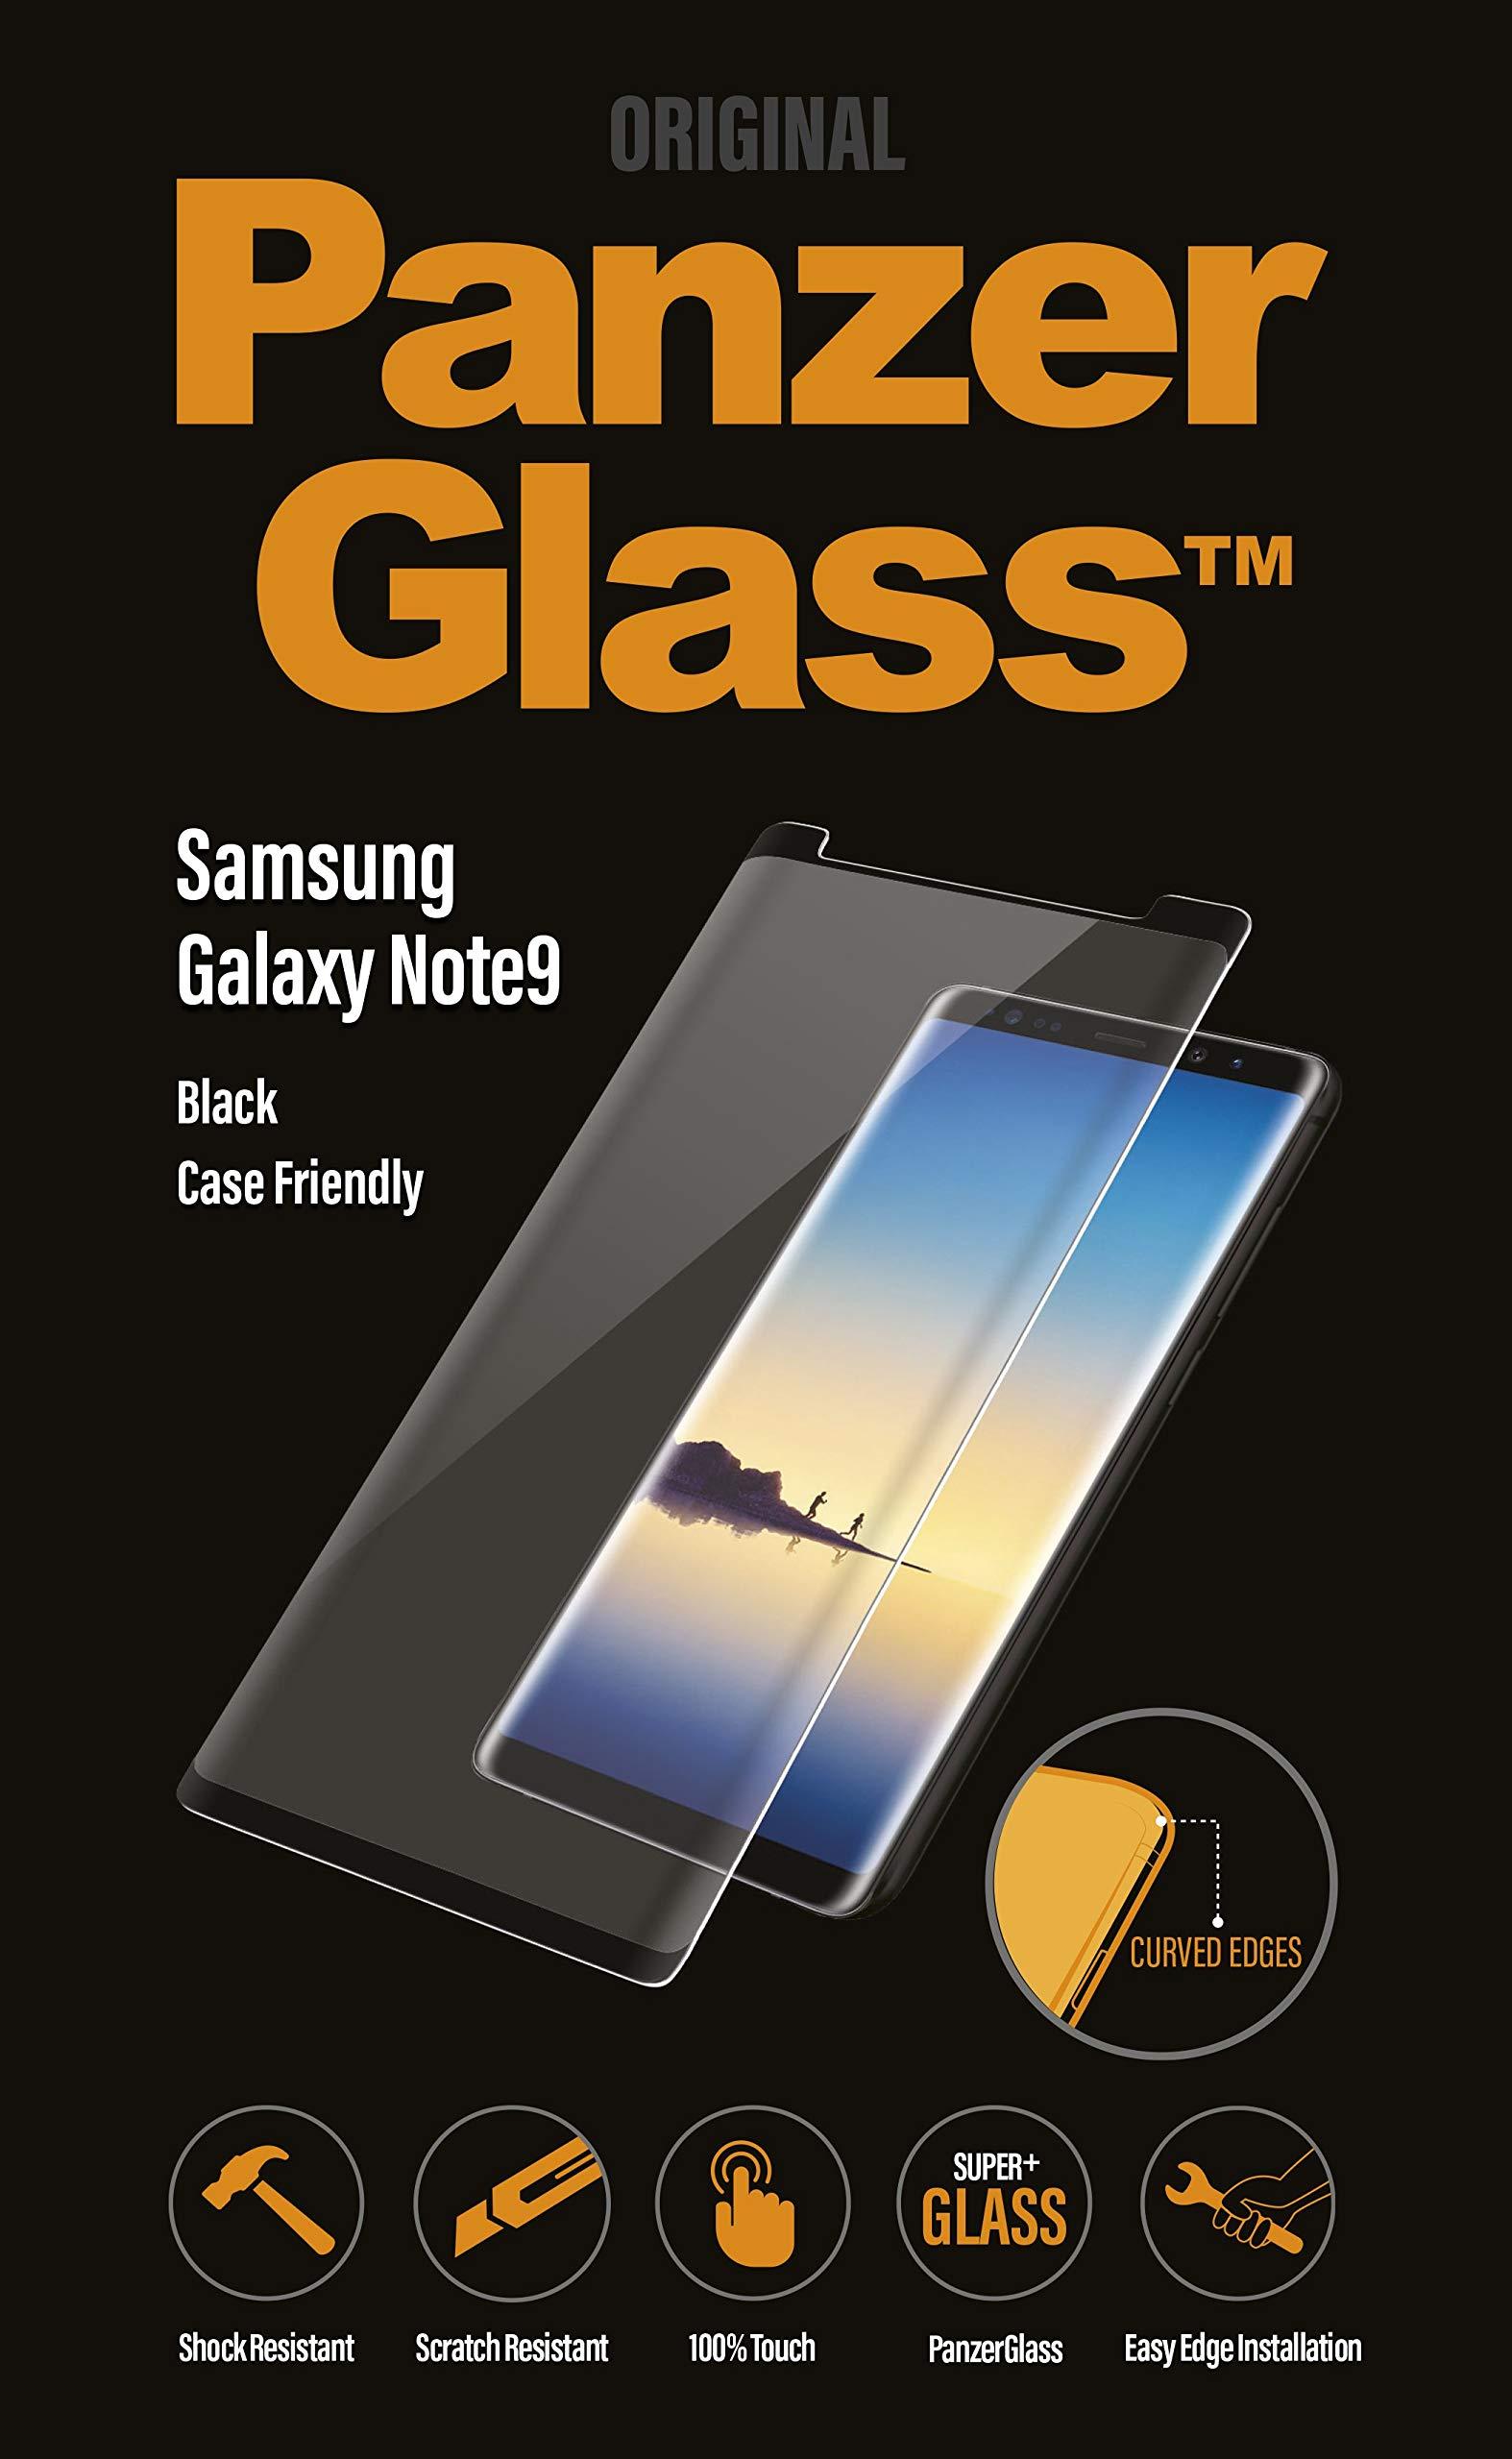 PanzerGlass Case Friendly for Galaxy Note 9 Black